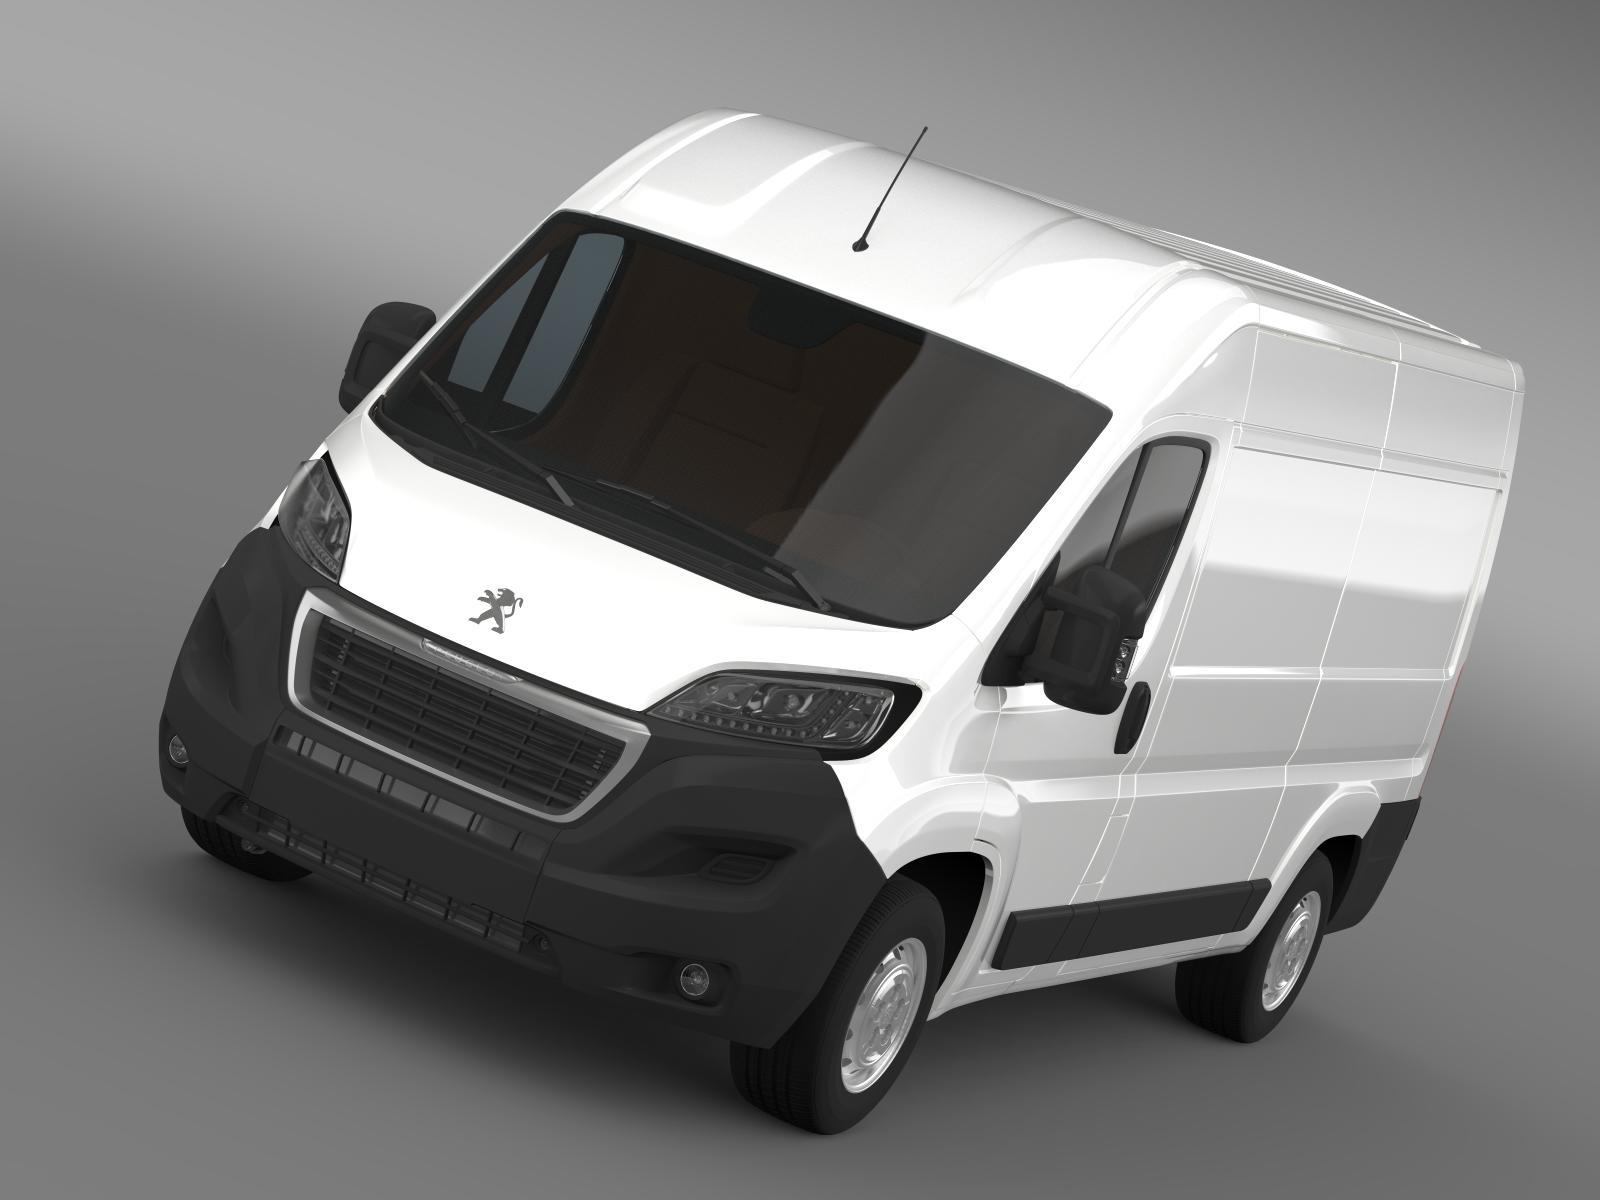 peugeot boxer furgons l2h2 2014 3d modelis 3ds max fbx c4d lwo ma mb hrc xsi obj 203063